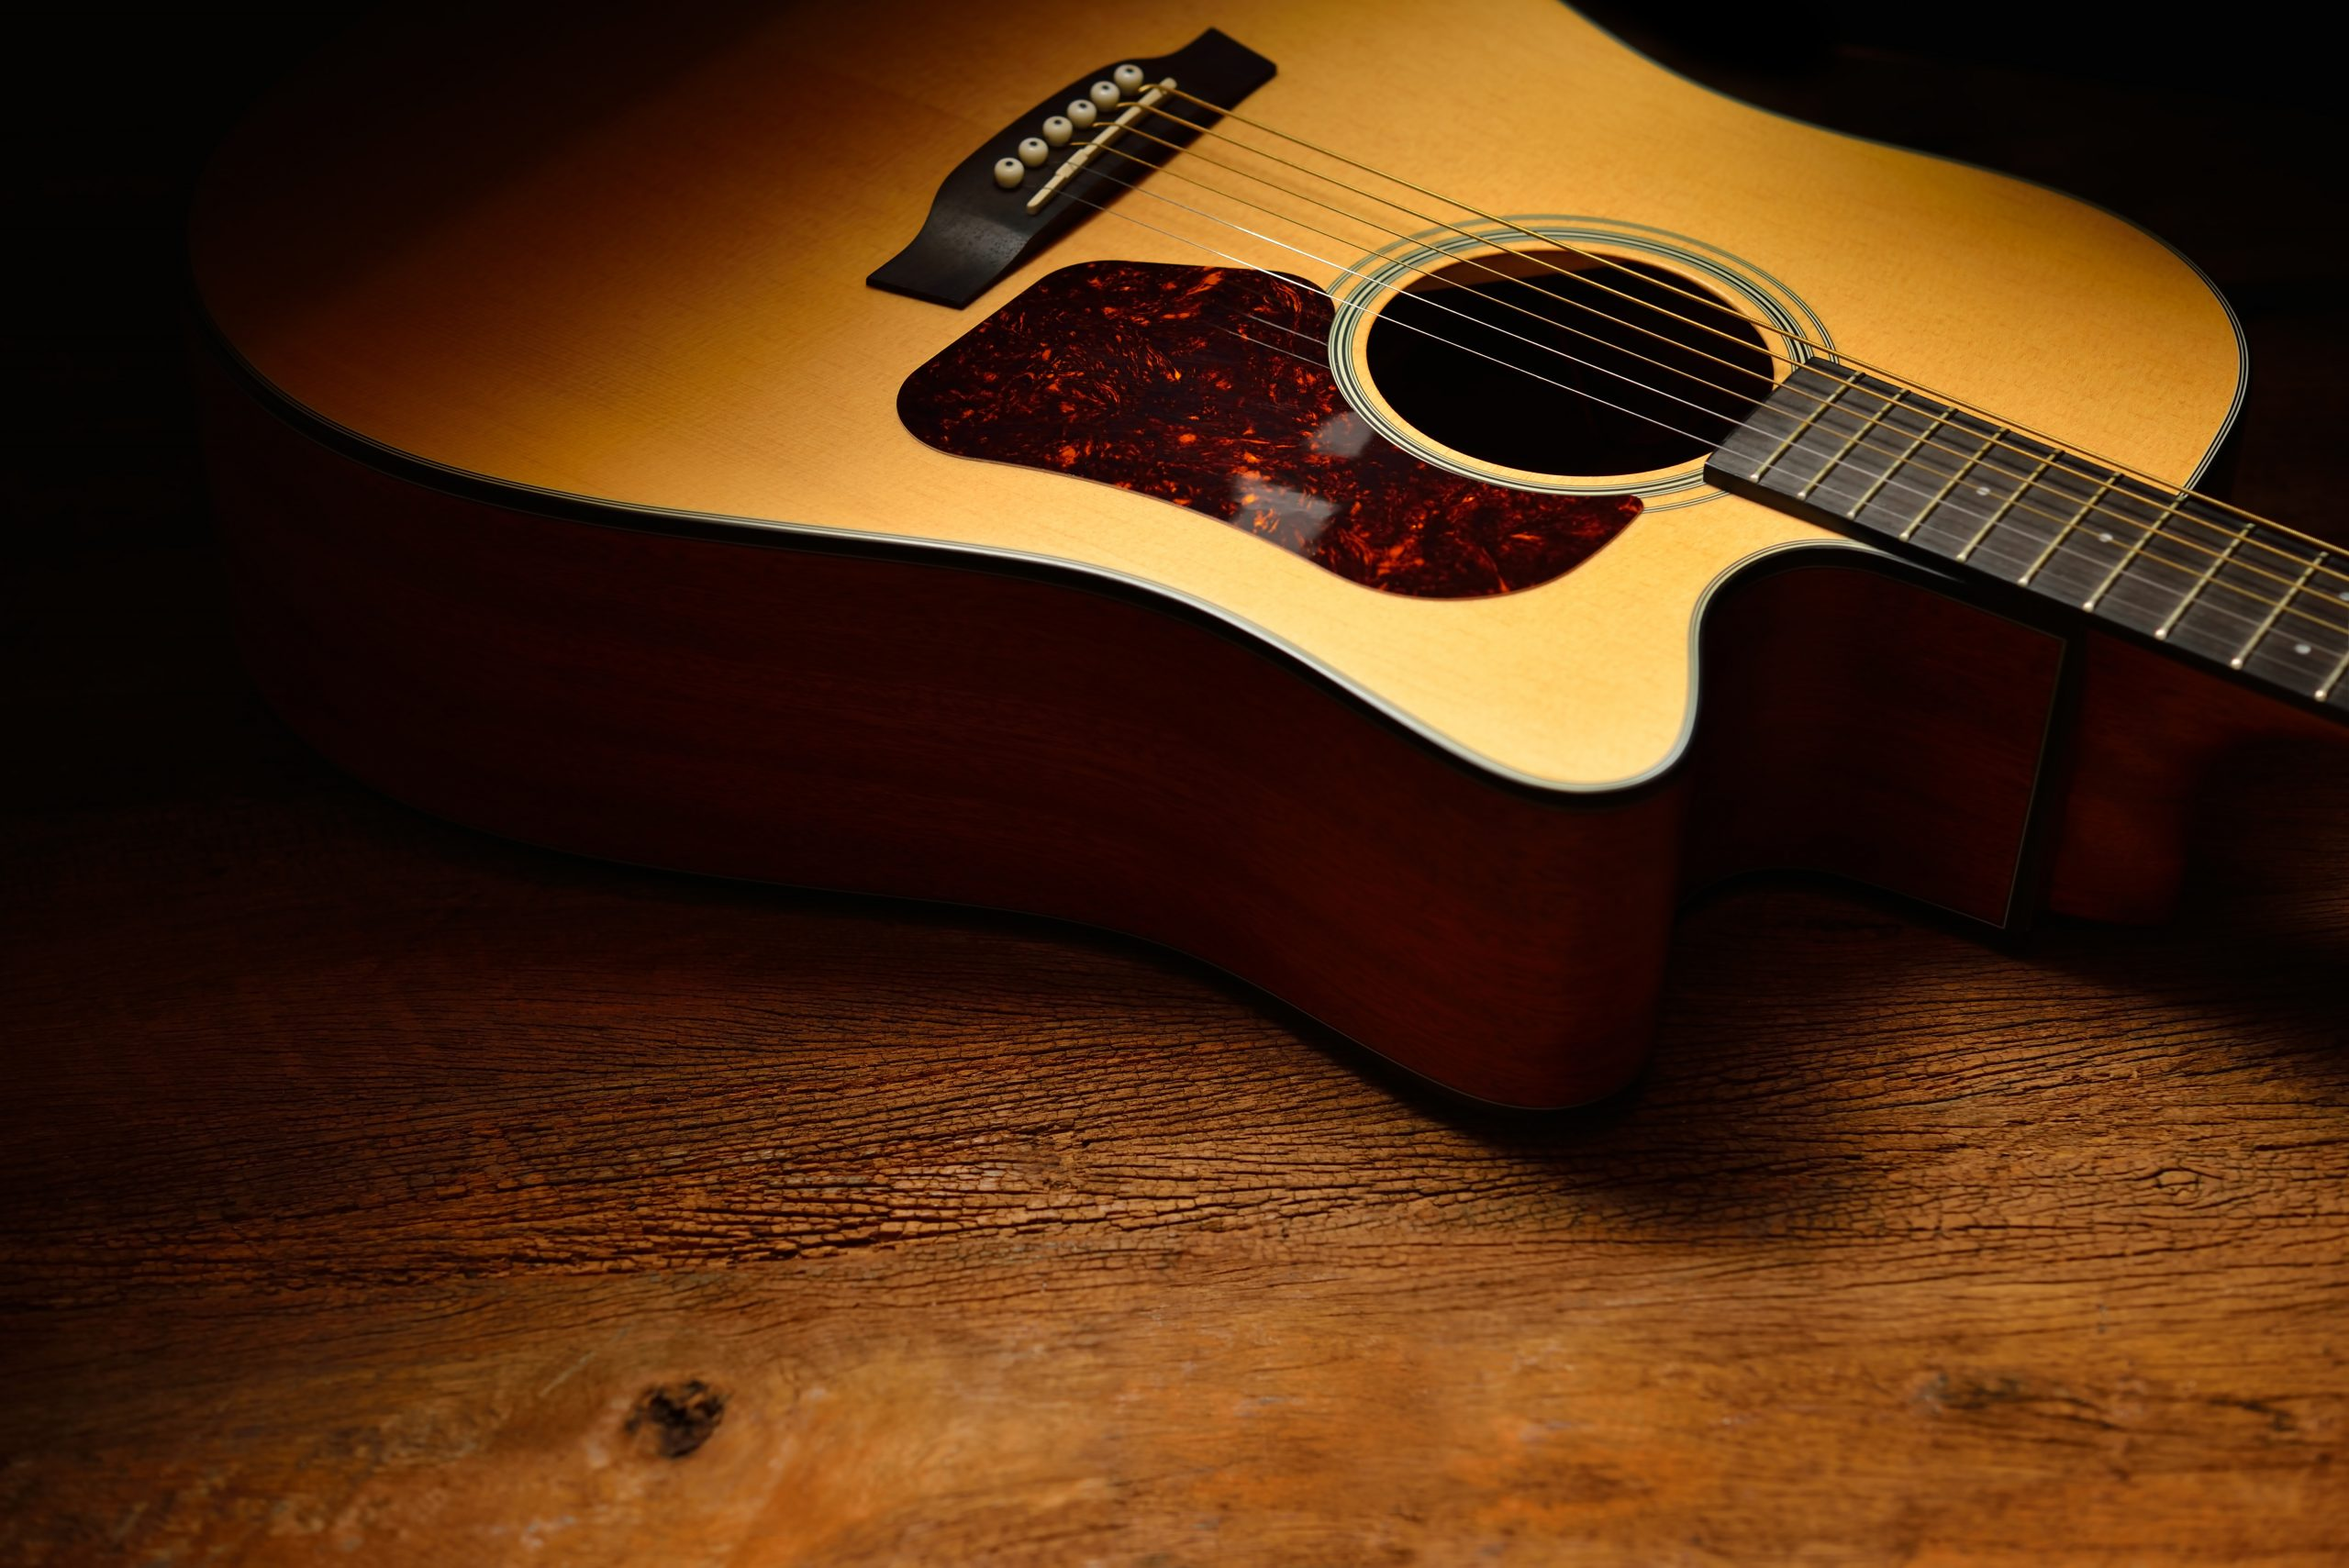 Guitarra acústica: ¿Cuál es la mejor del 2020?